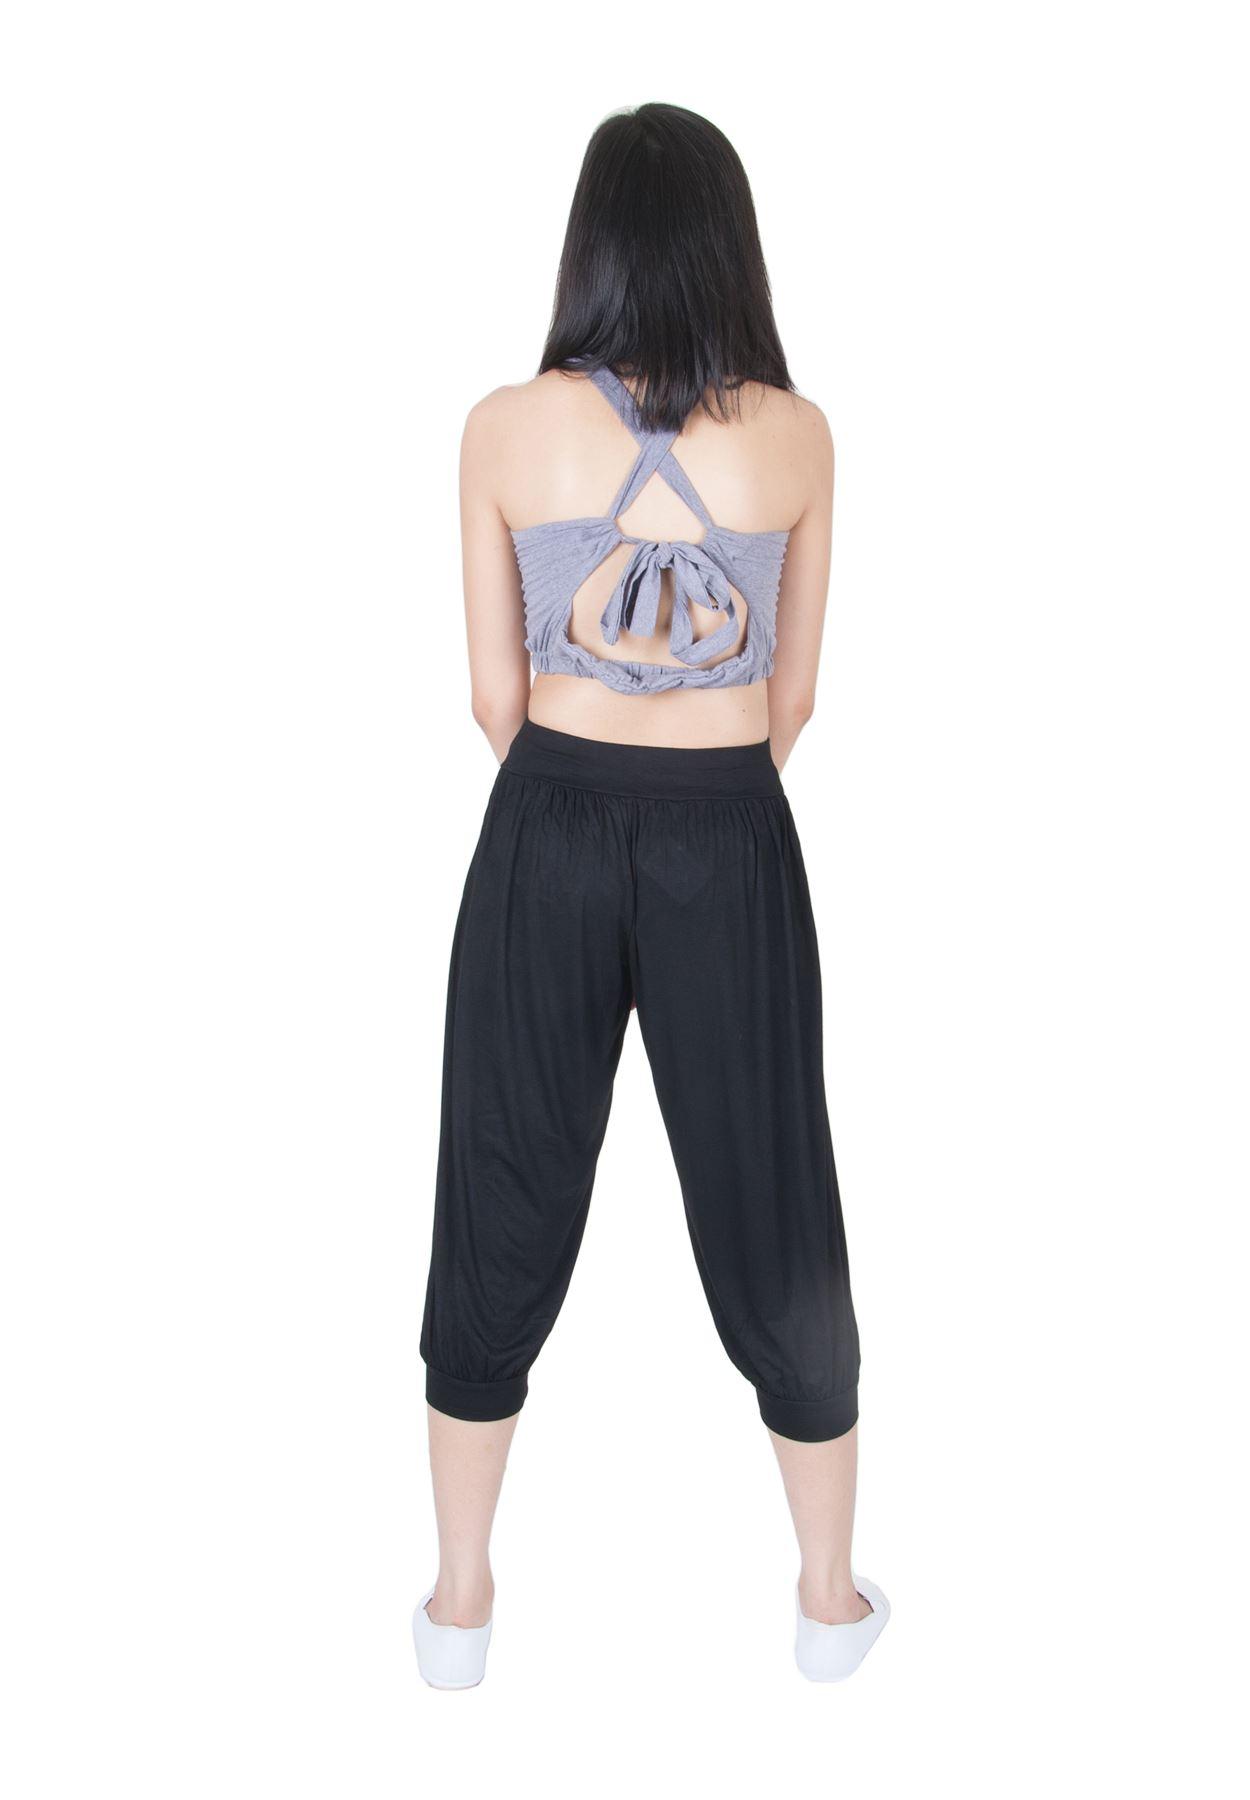 capri spandex pants - Pi Pants